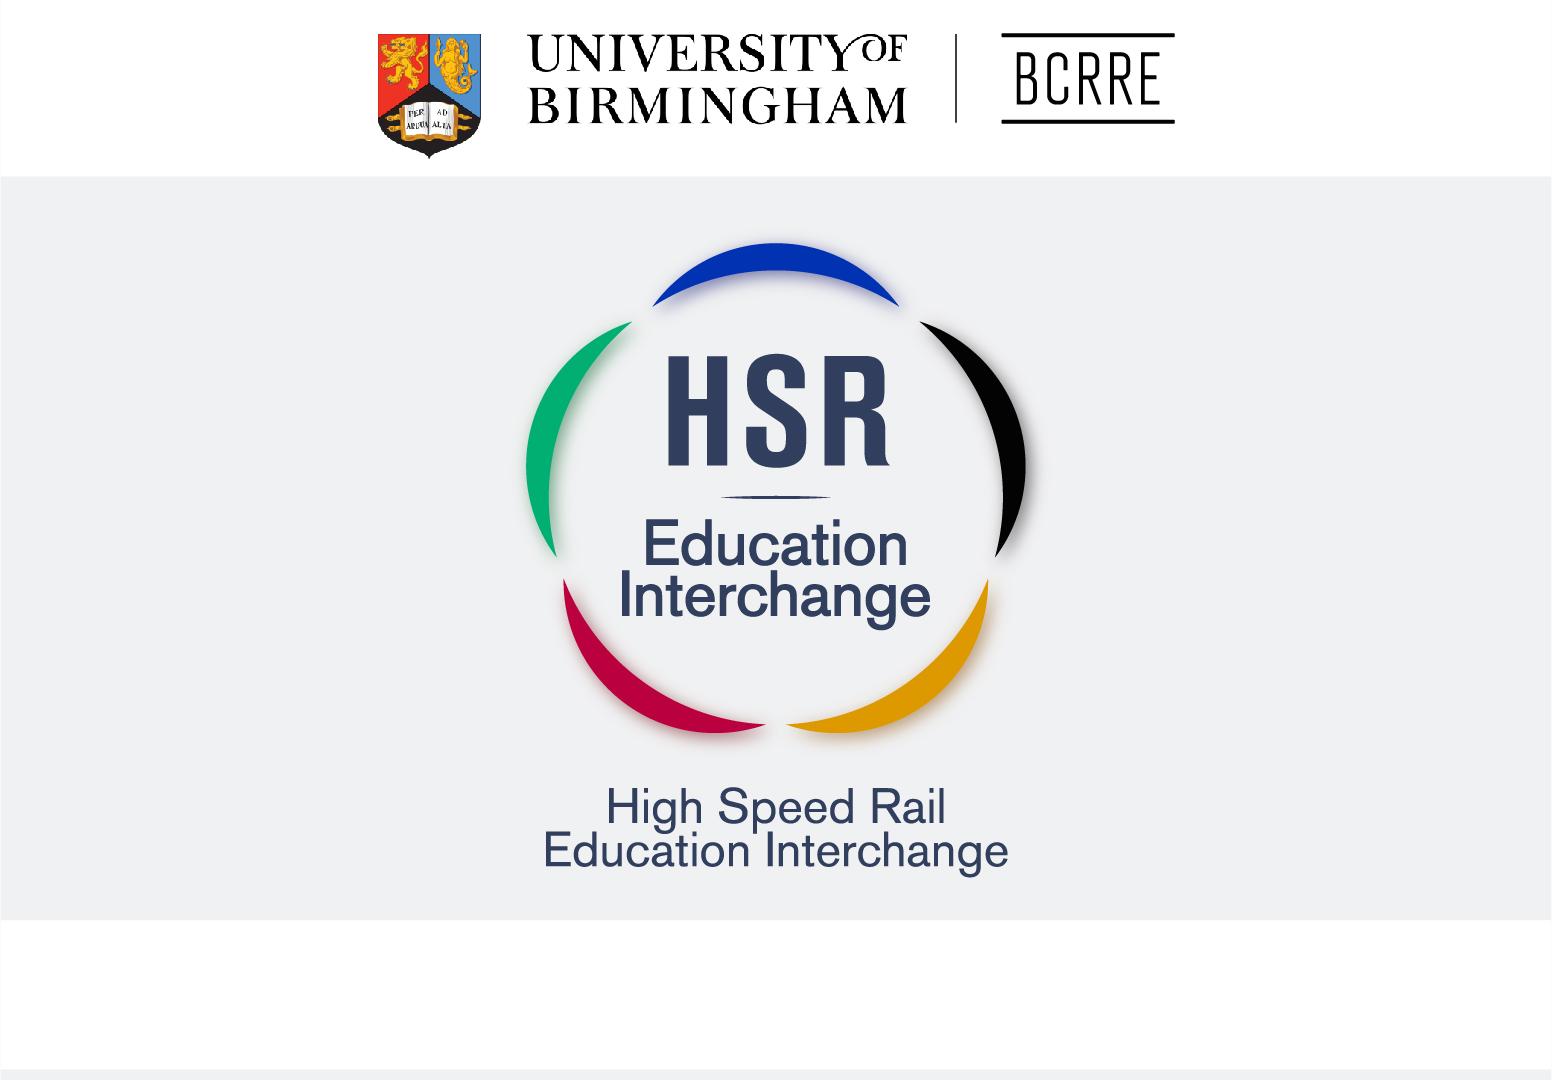 High Speed Rail: Education Interchange